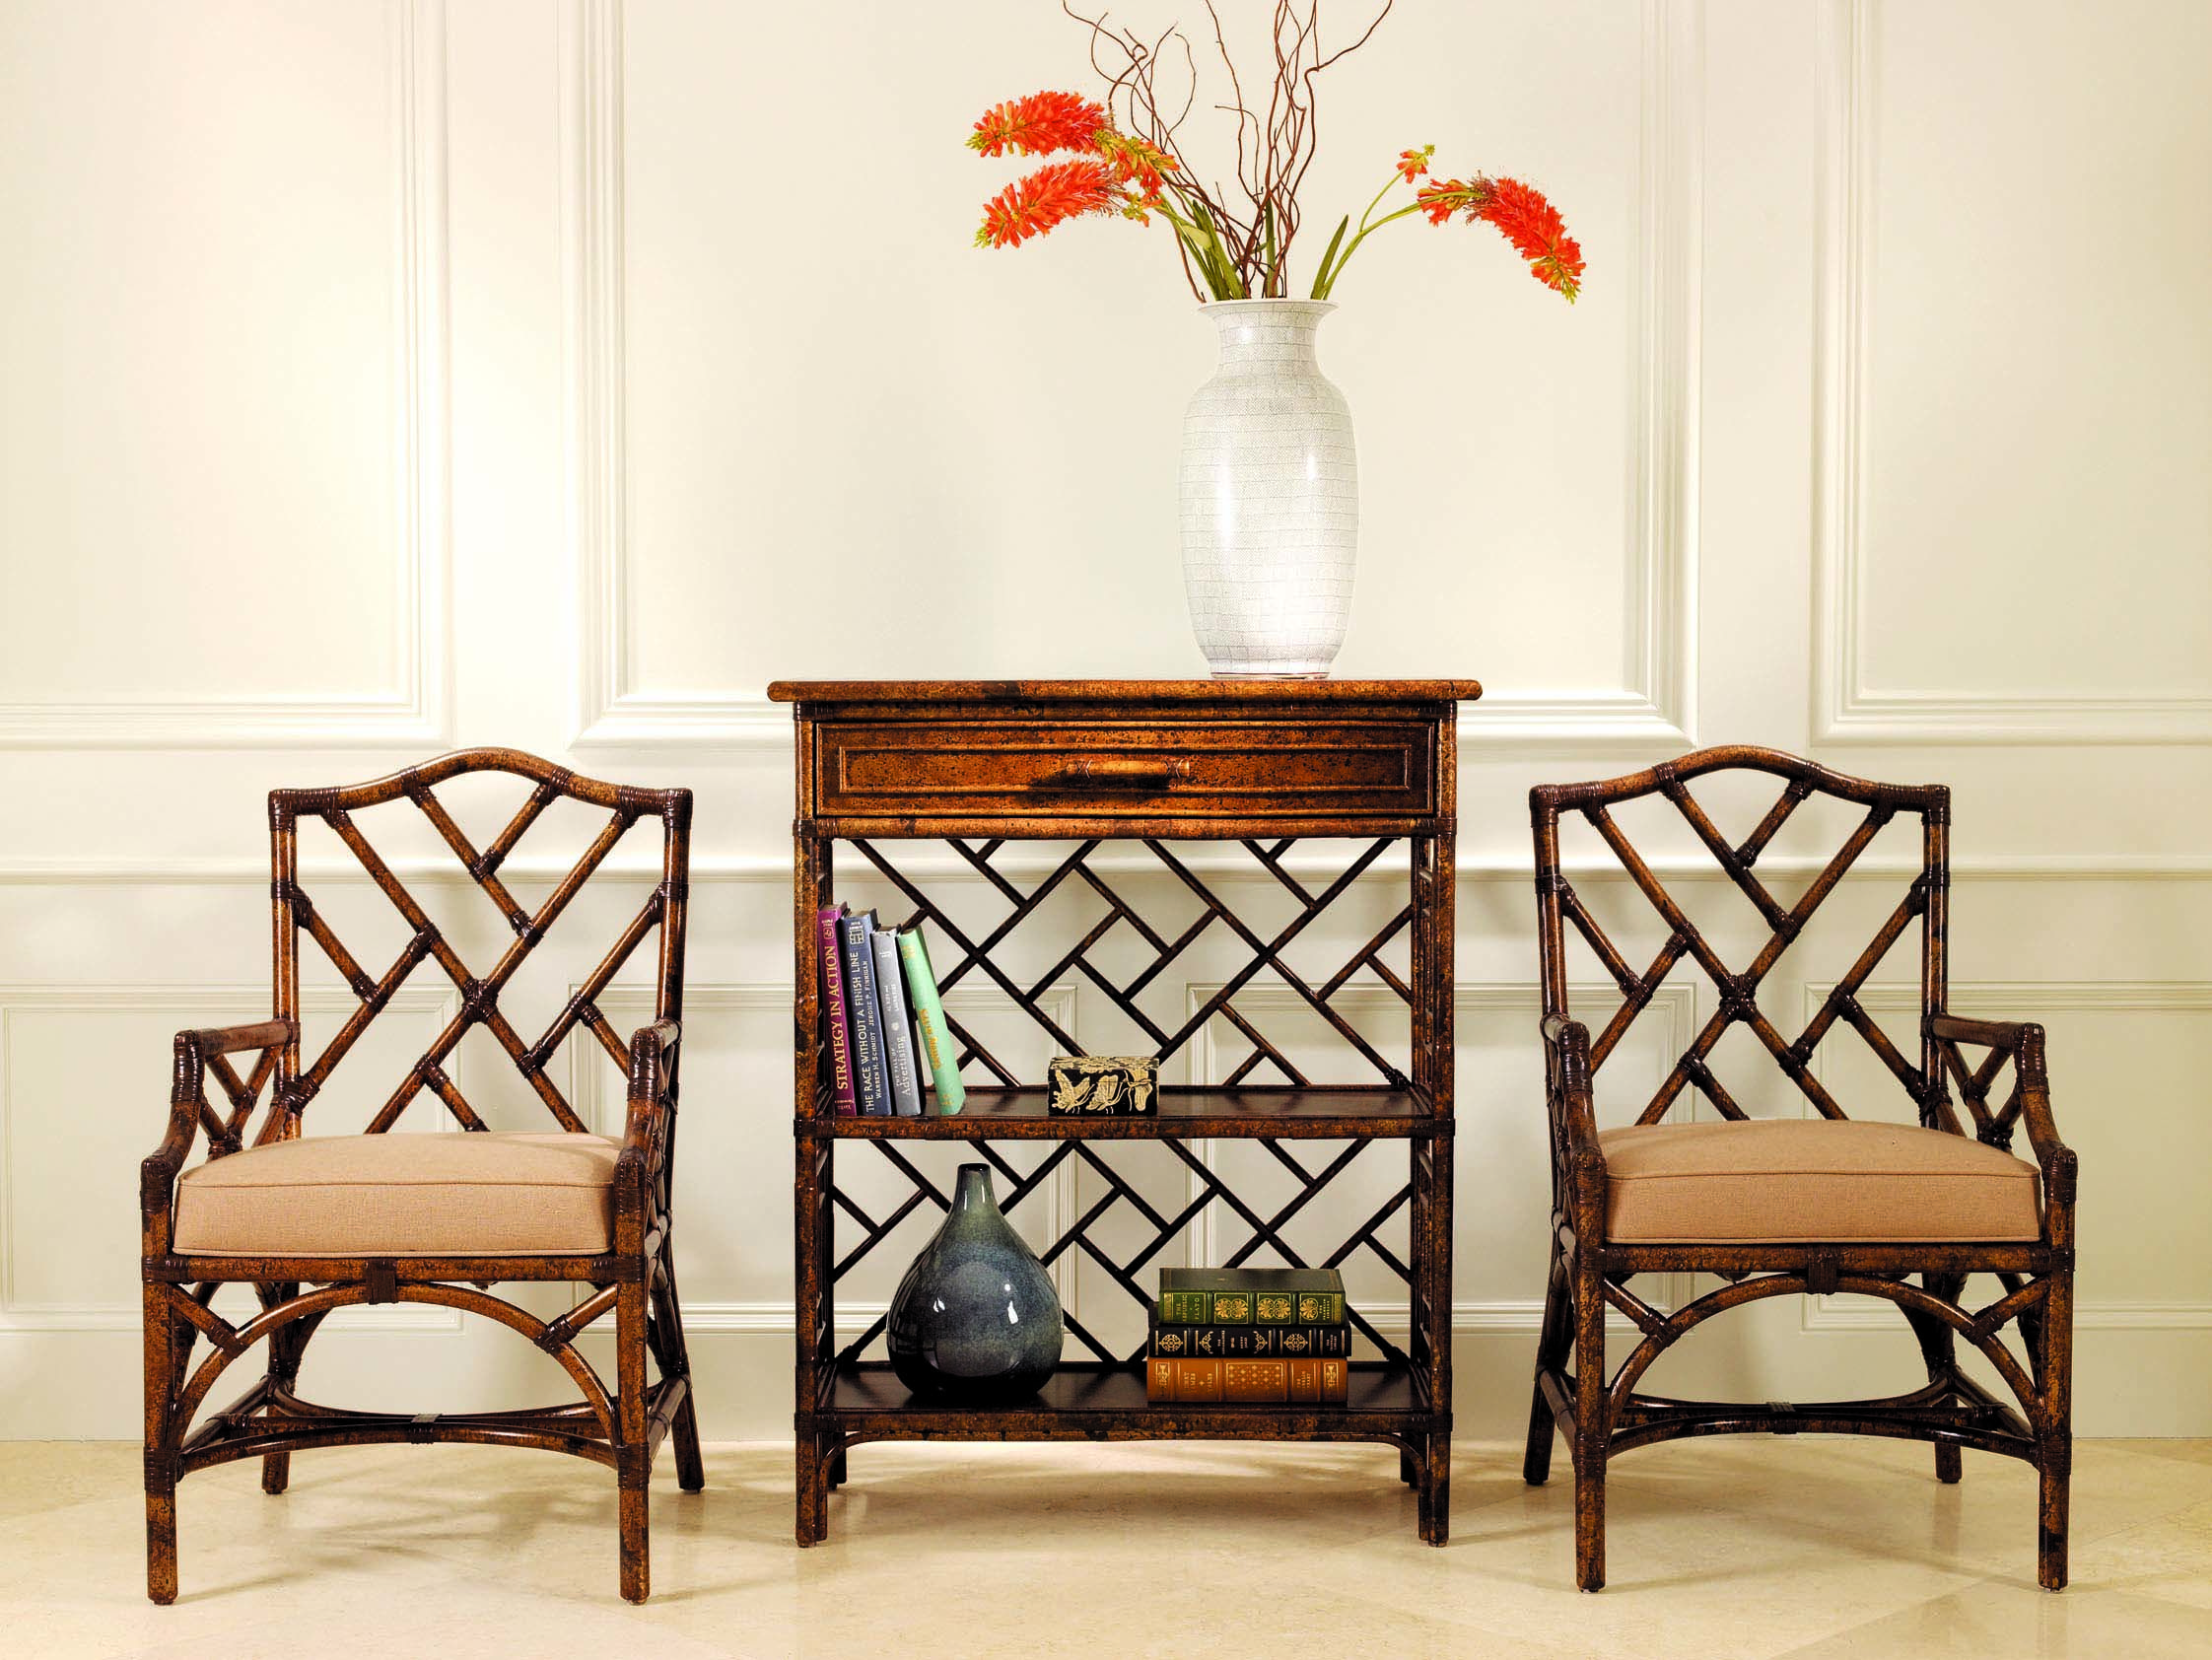 david francis furniture interhall ih chippendale  - david francis furniture interhall ih chippendale designonhpmktdavidfrancisfur